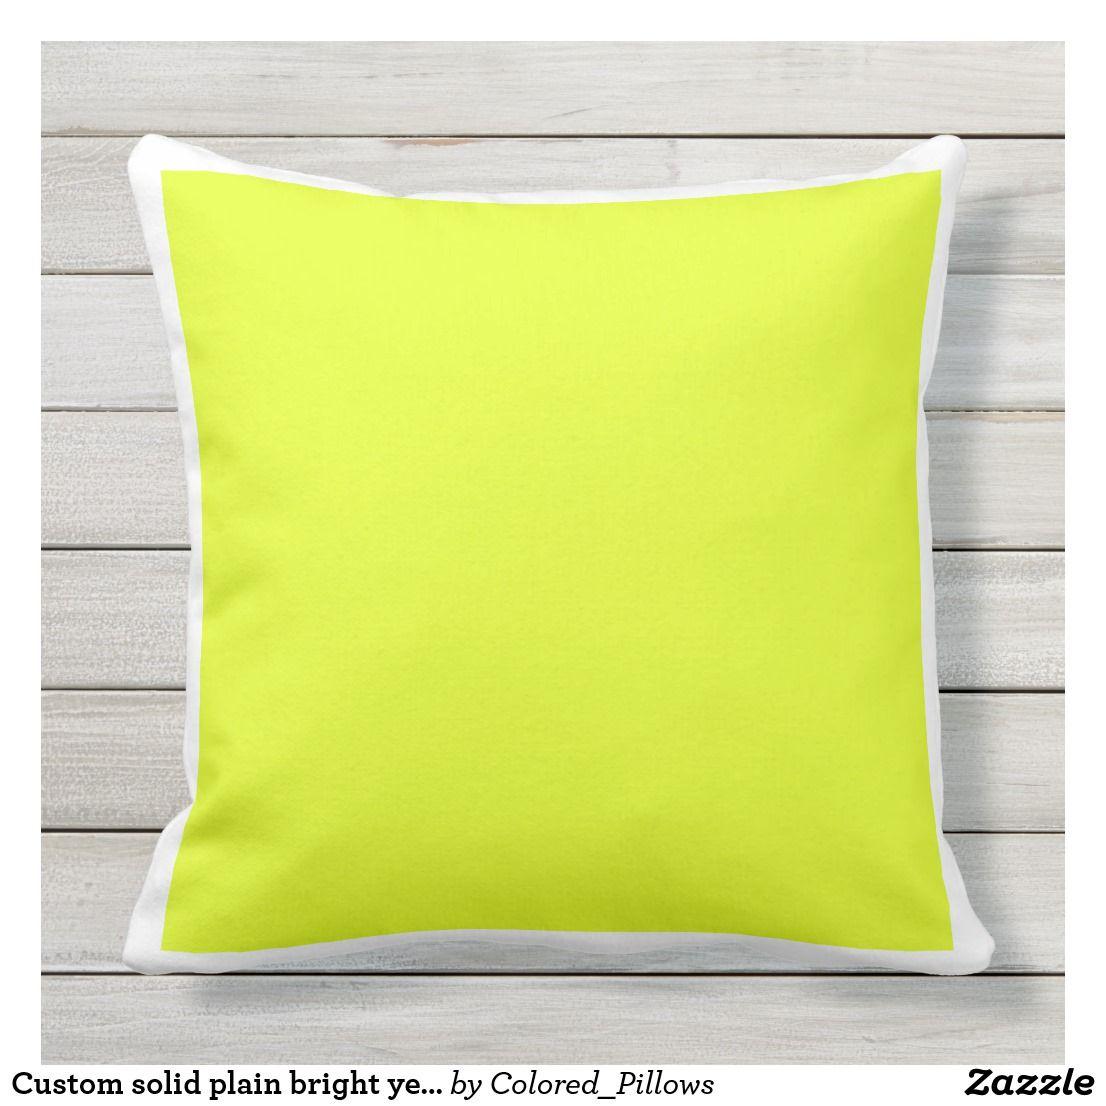 Custom Solid Plain Bright Yellow White Frame Yellow Decorative